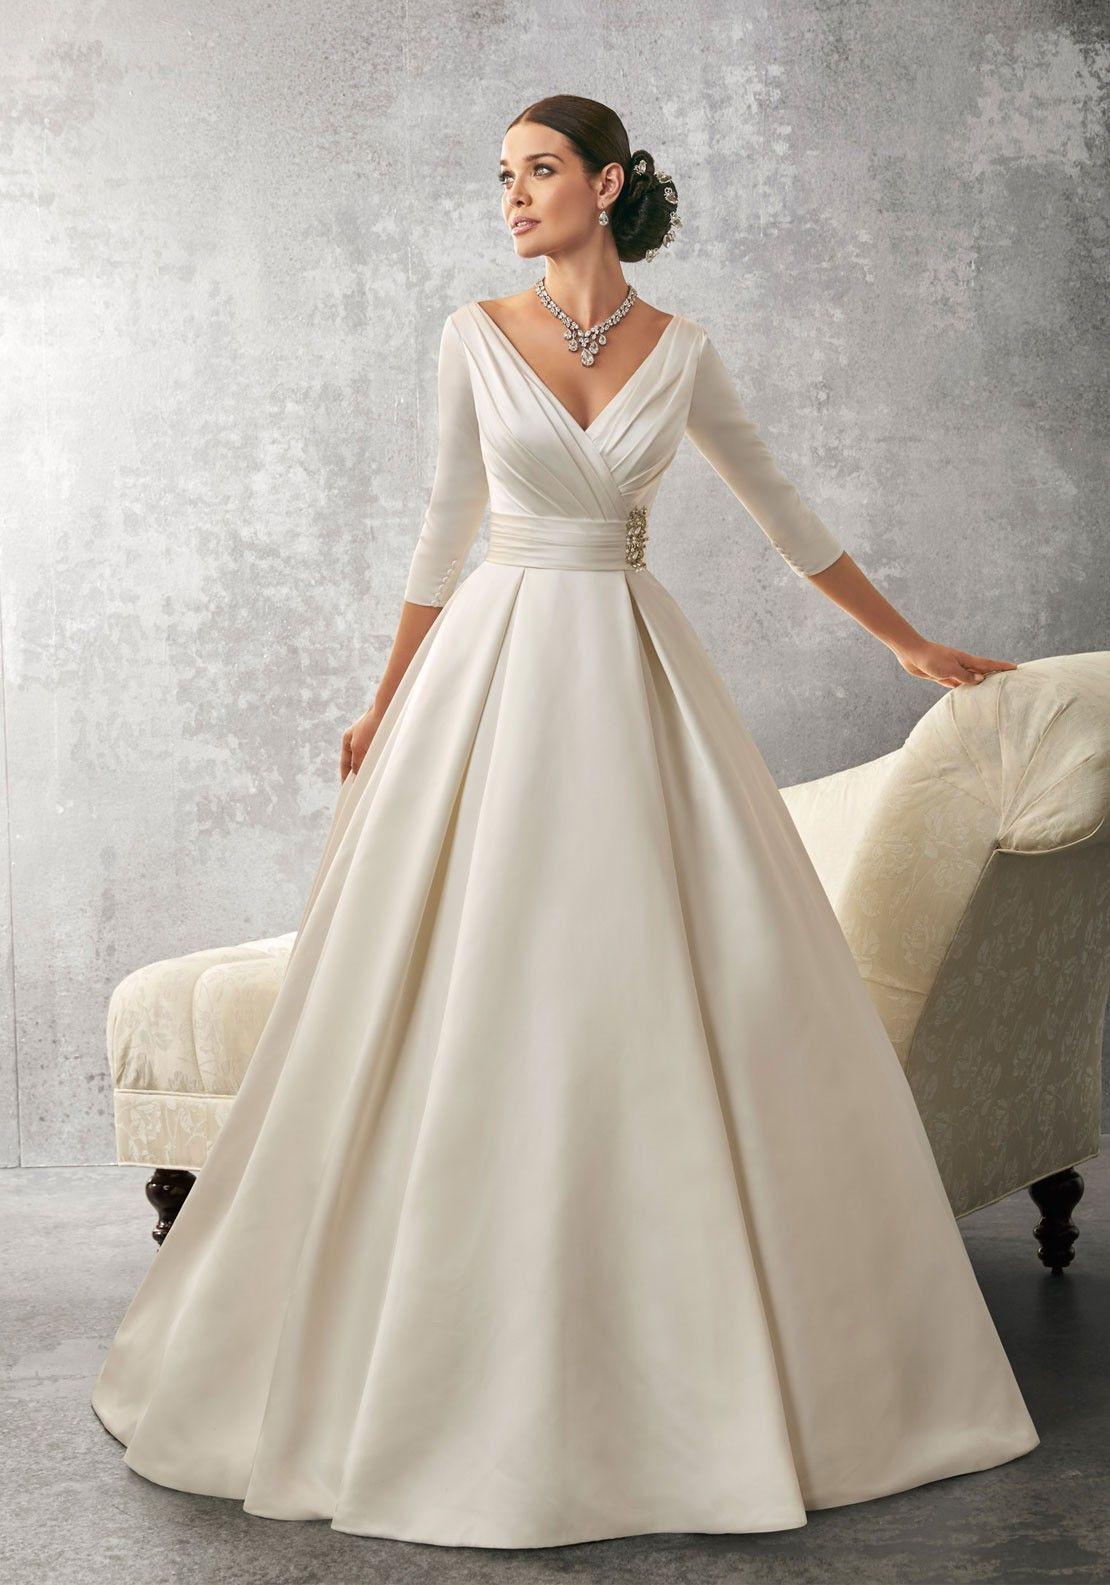 Wedding Dress Idea White Dupion Silk Fabric Use Covered Ons Rather Than Rhinestone Full Length Sleeves